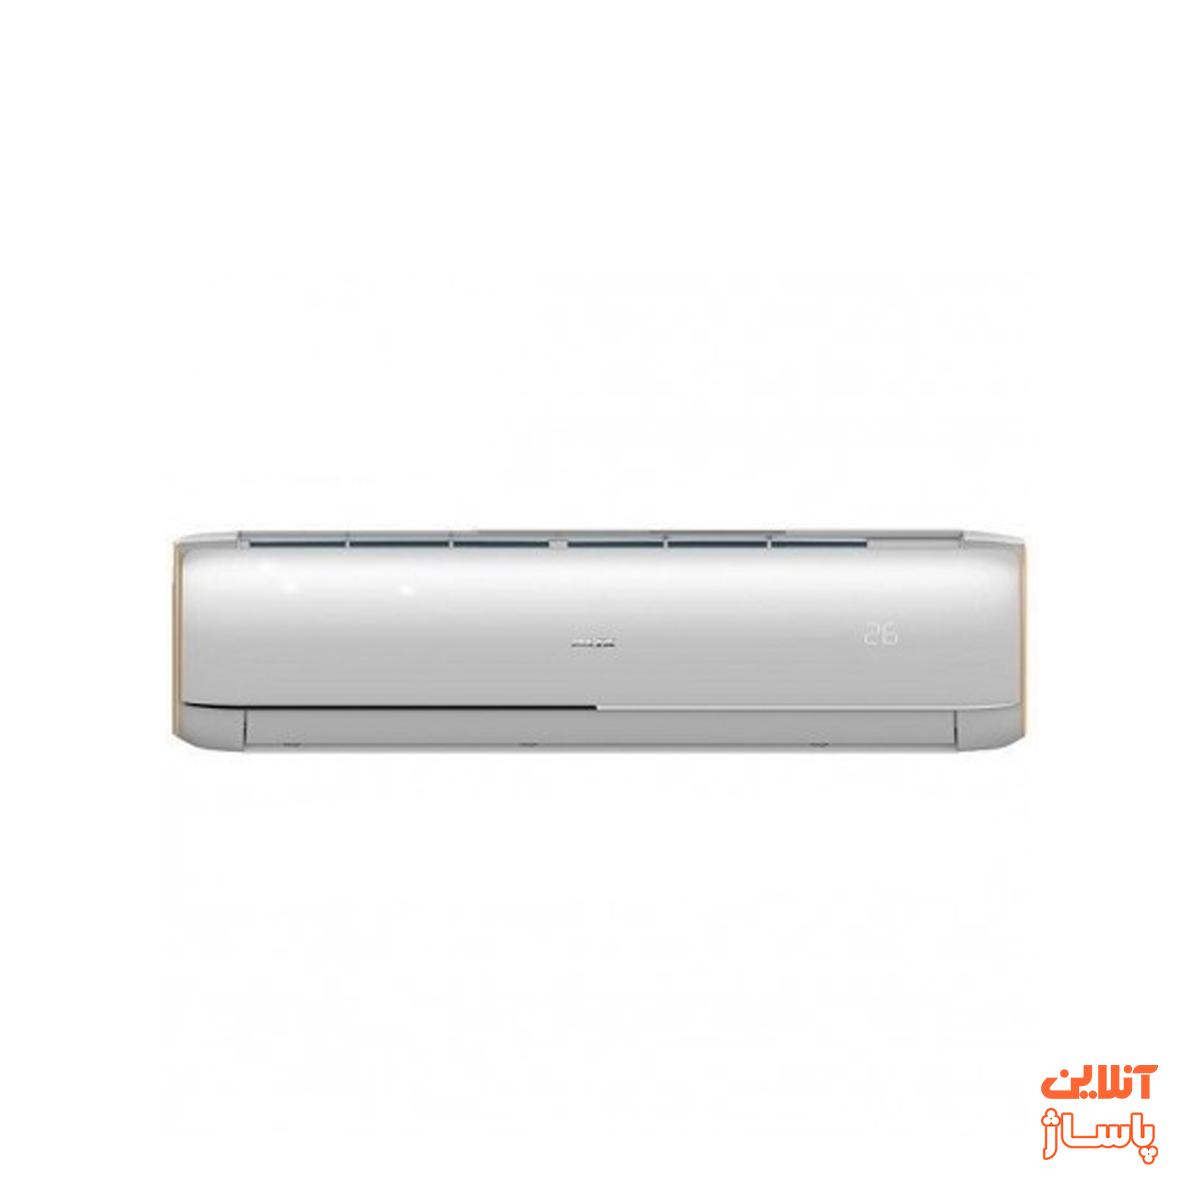 کولر گازی سرد و گرم اینورتر آکس مدل ZT118A4/D1